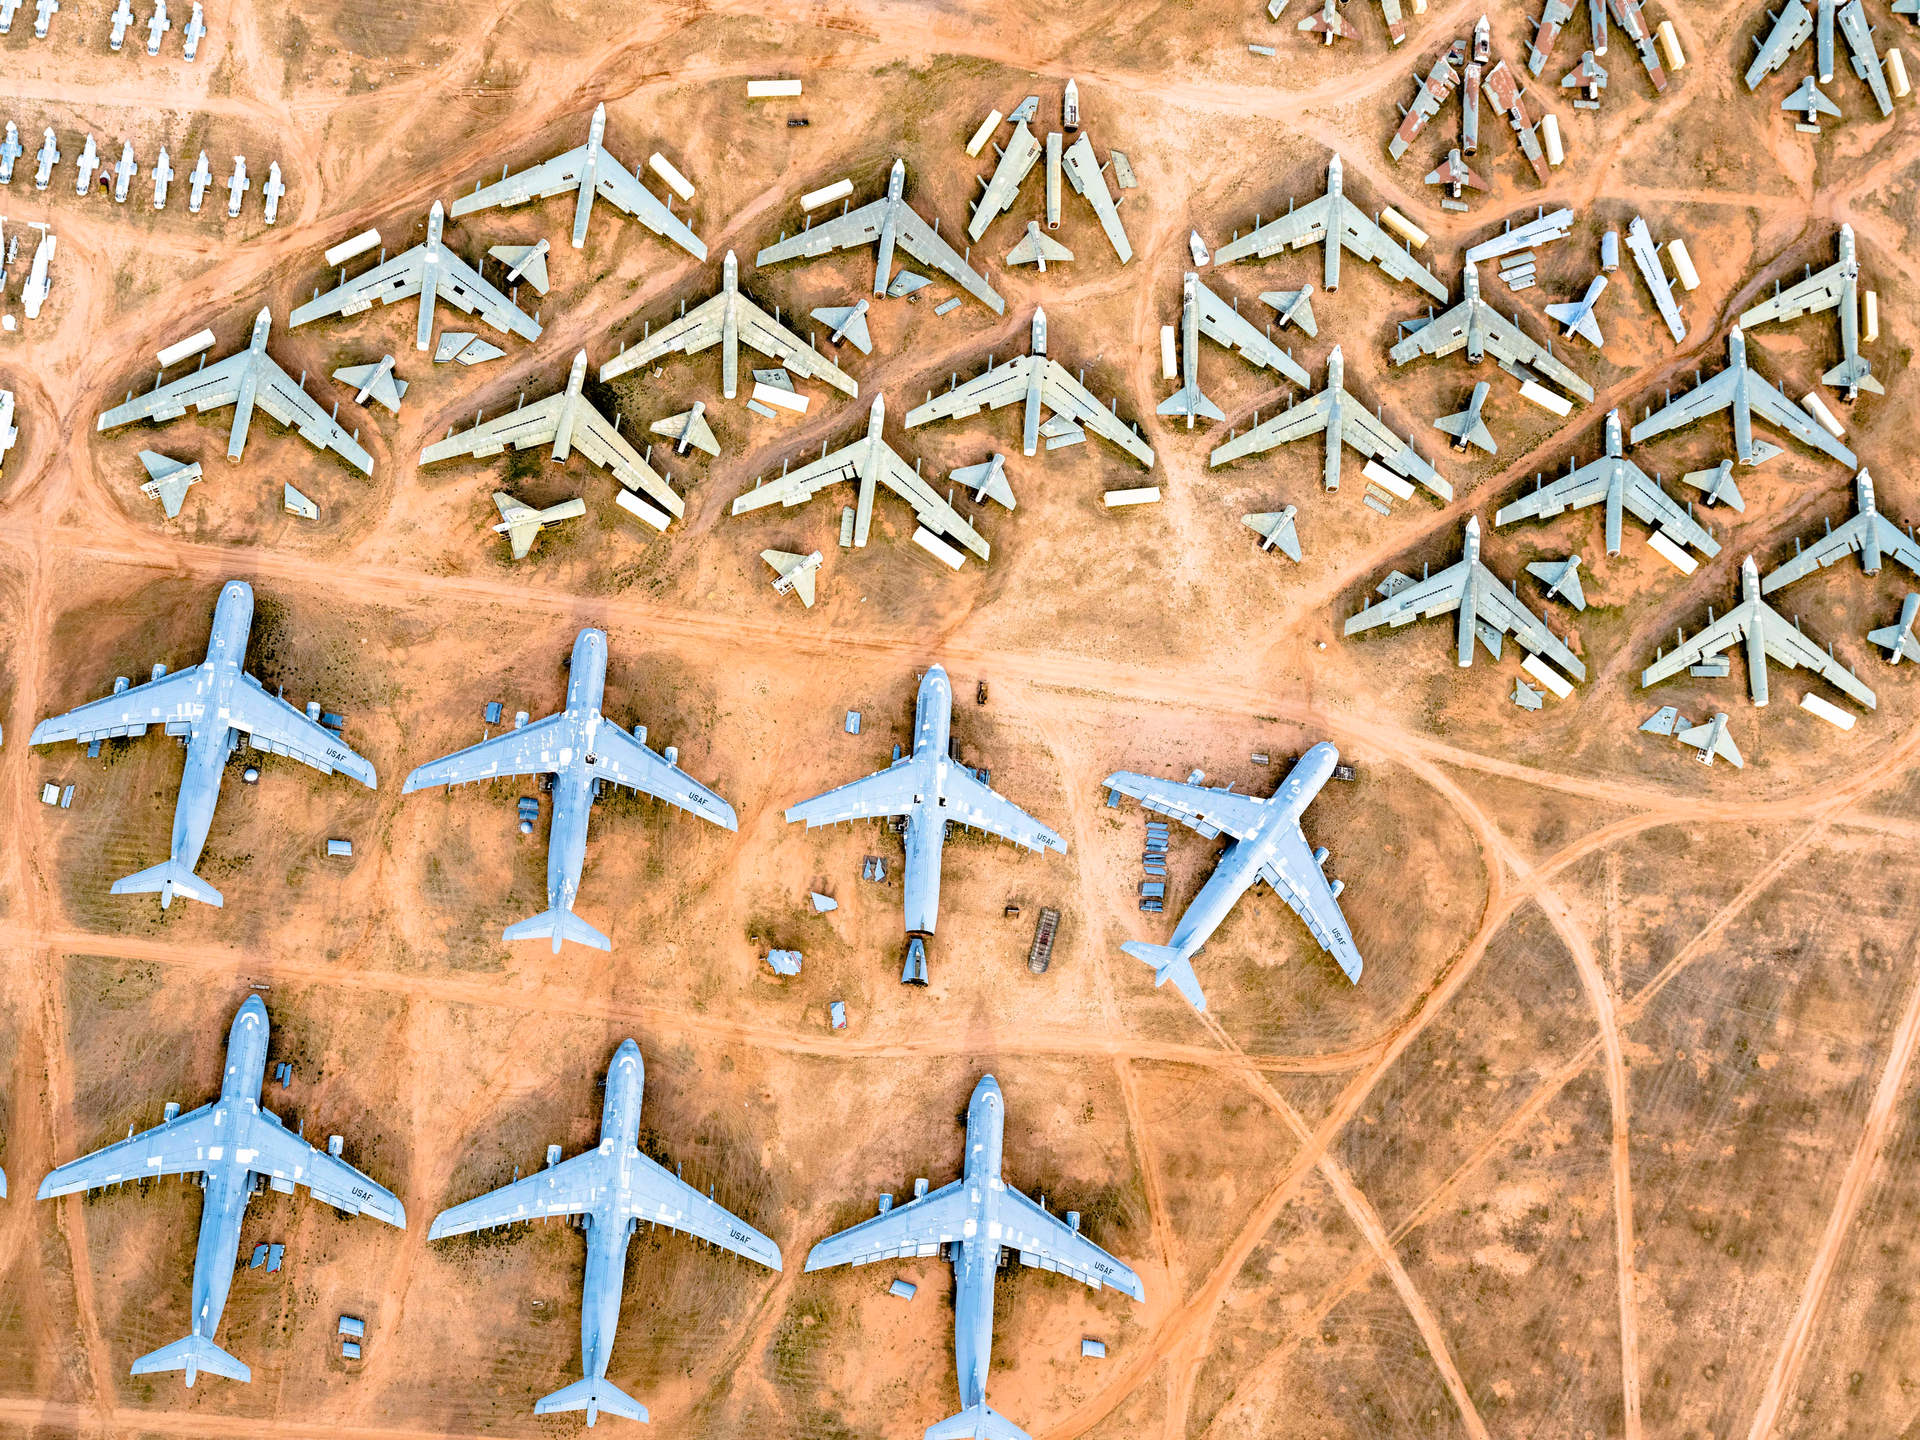 'Squadron', Davis-Monthan Air Force Base, Tucson, Arizona